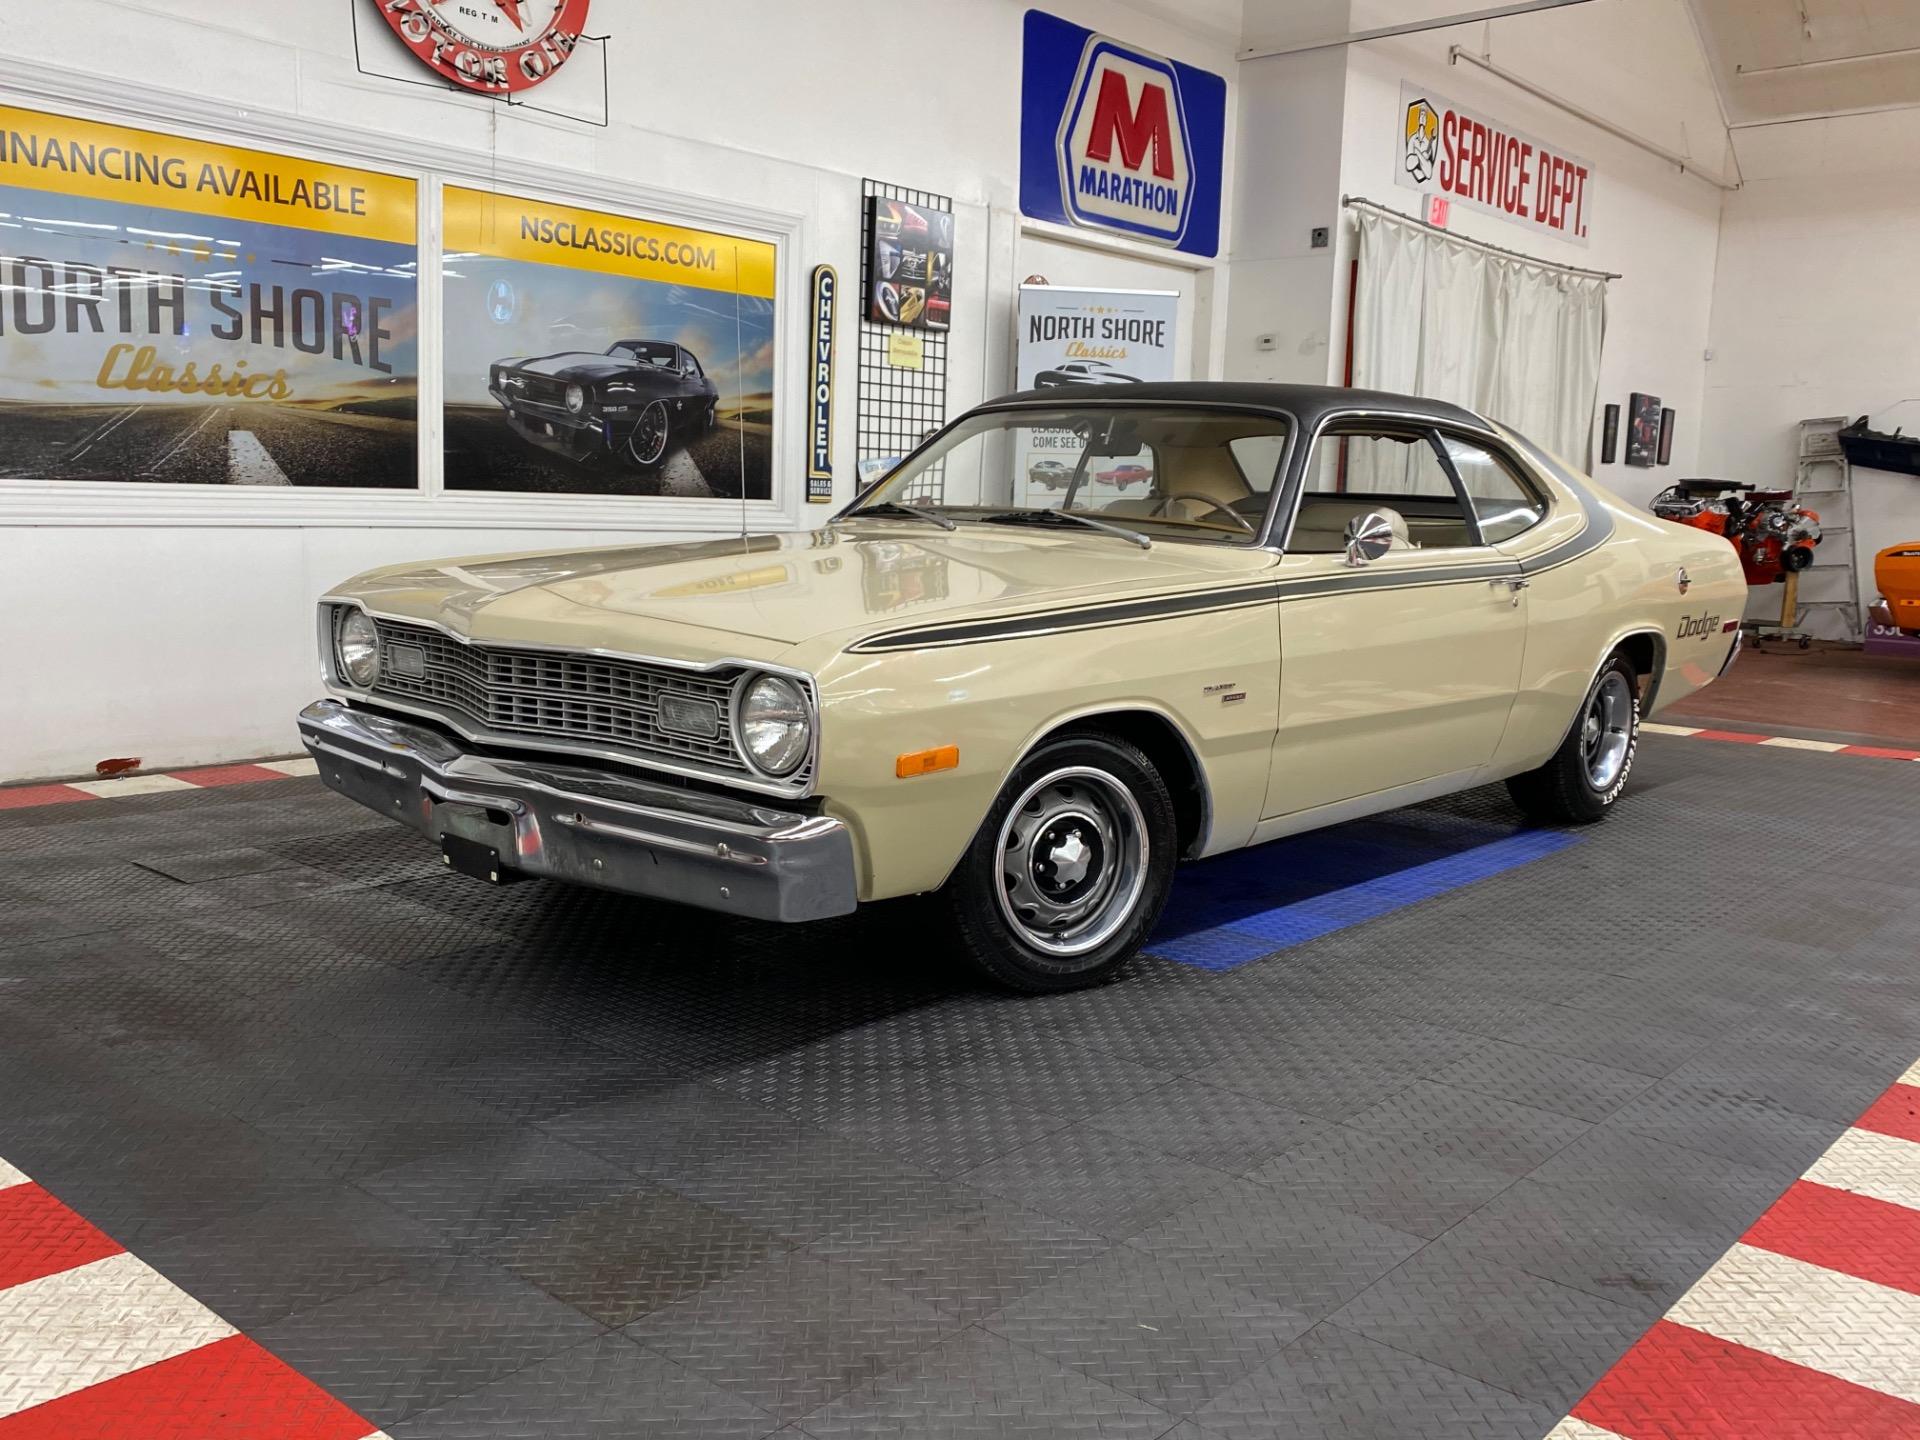 Used 1973 Dodge Dart - CLEAN ORIGINAL CONDITION - 318 V8 ENGINE - SEE VIDEO - | Mundelein, IL